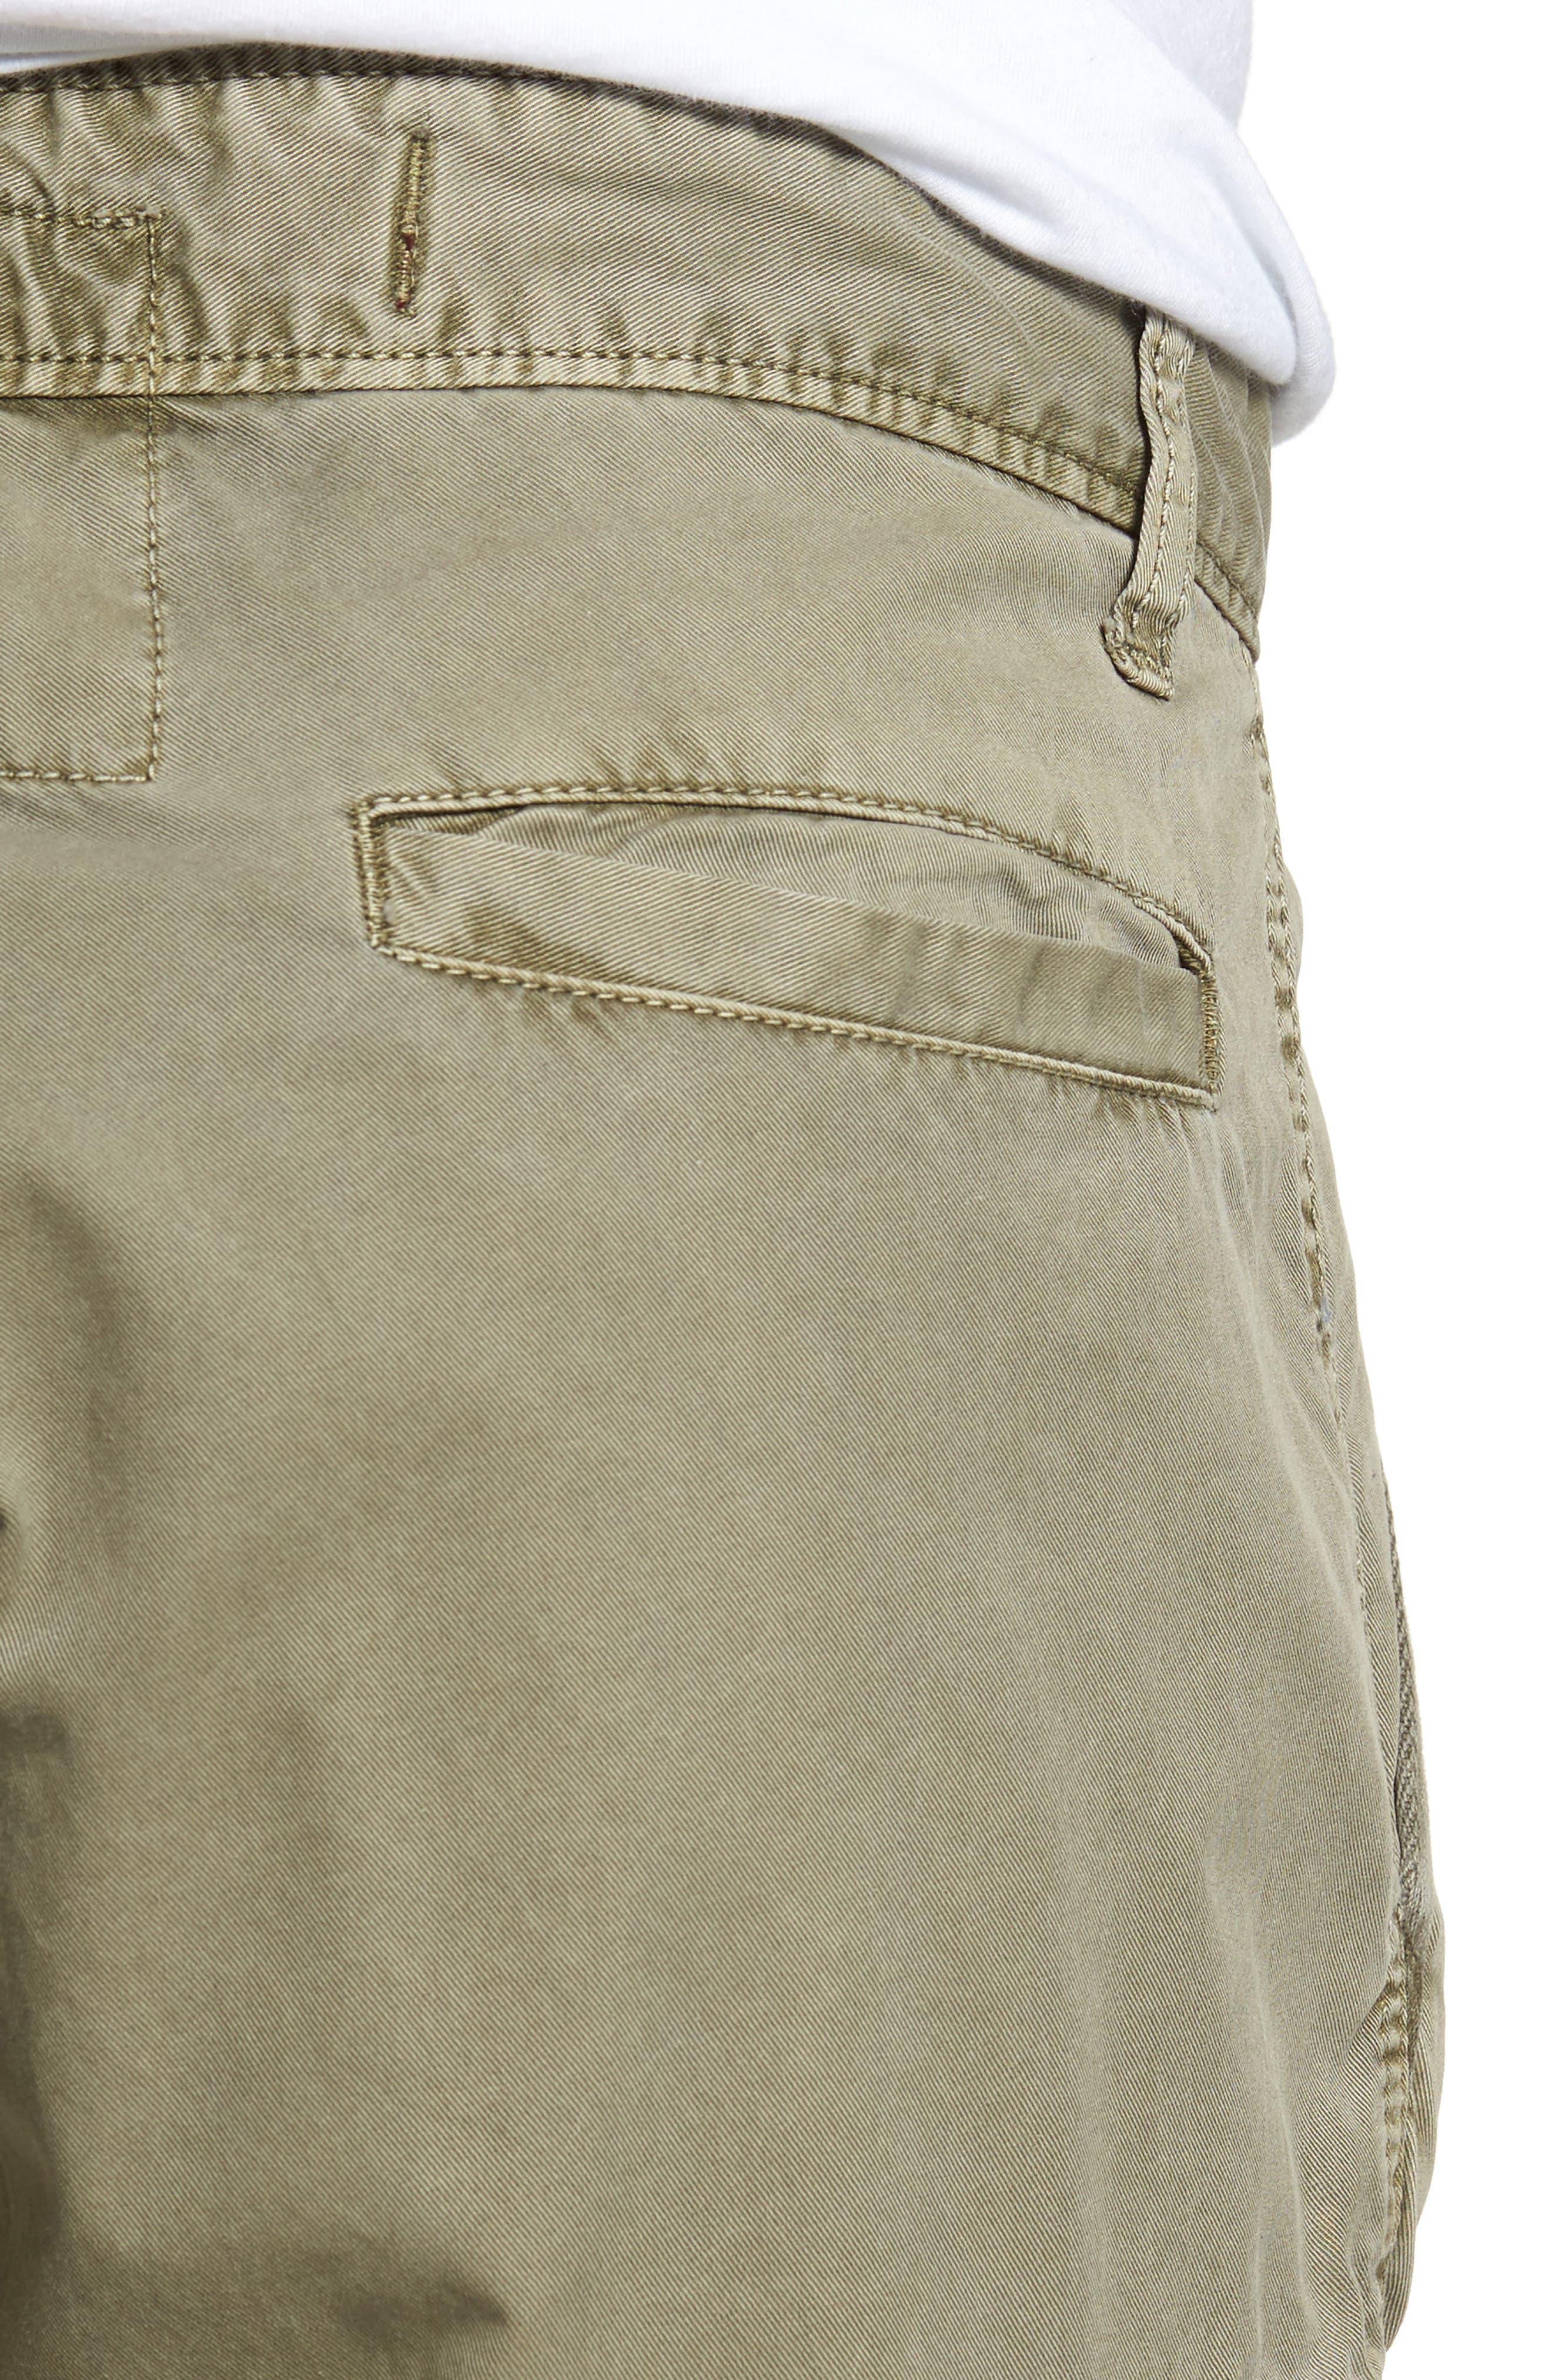 'Newport' Cargo Shorts,                             Alternate thumbnail 4, color,                             Olive